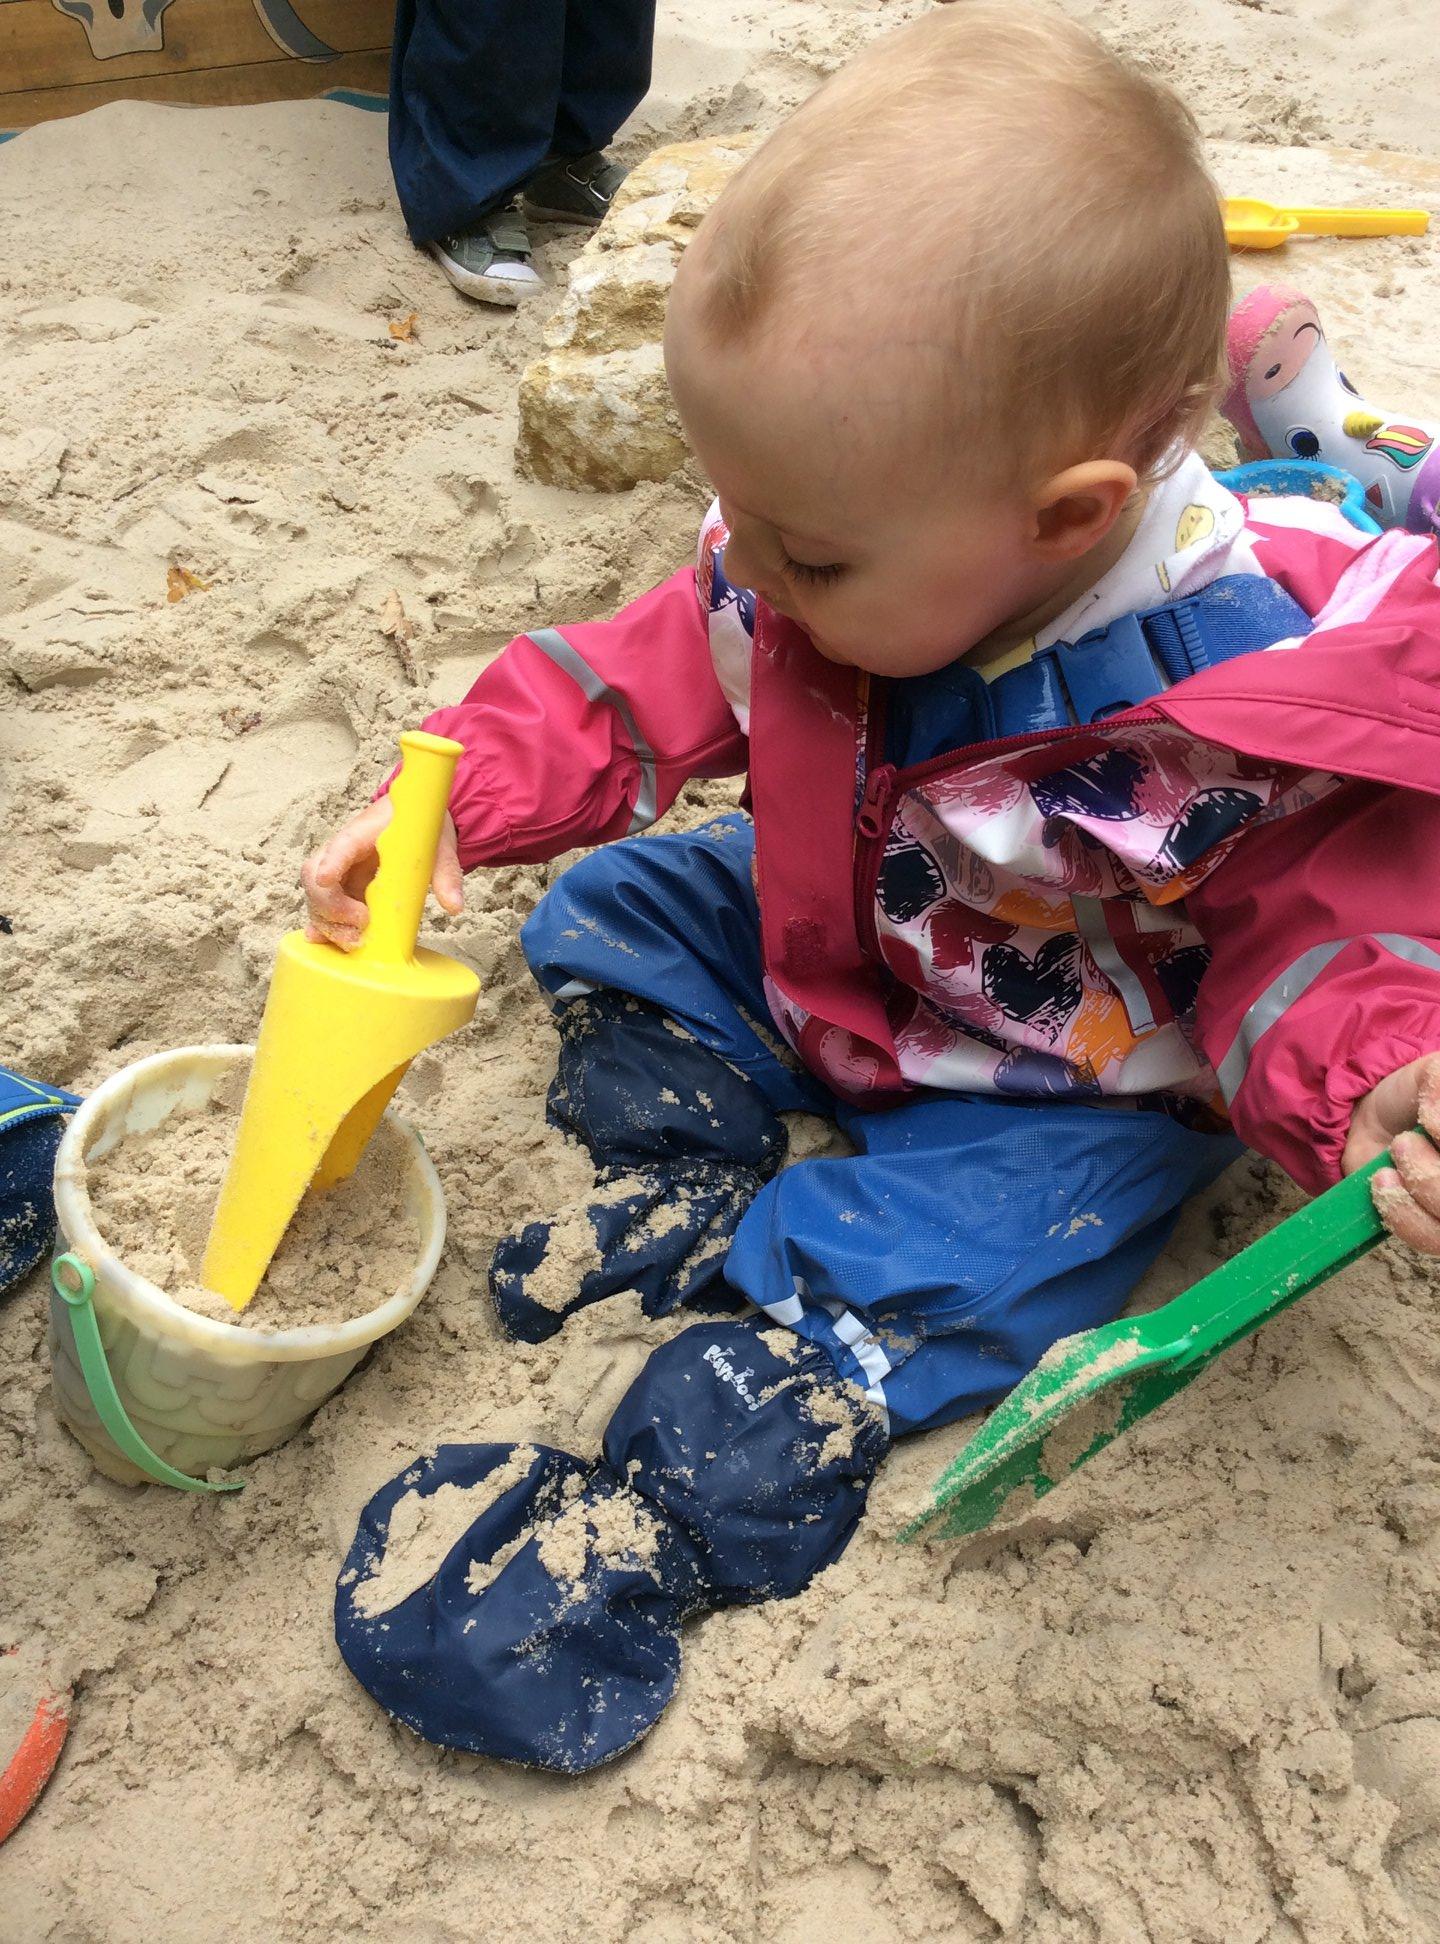 Enroling at Dorset Nurseries